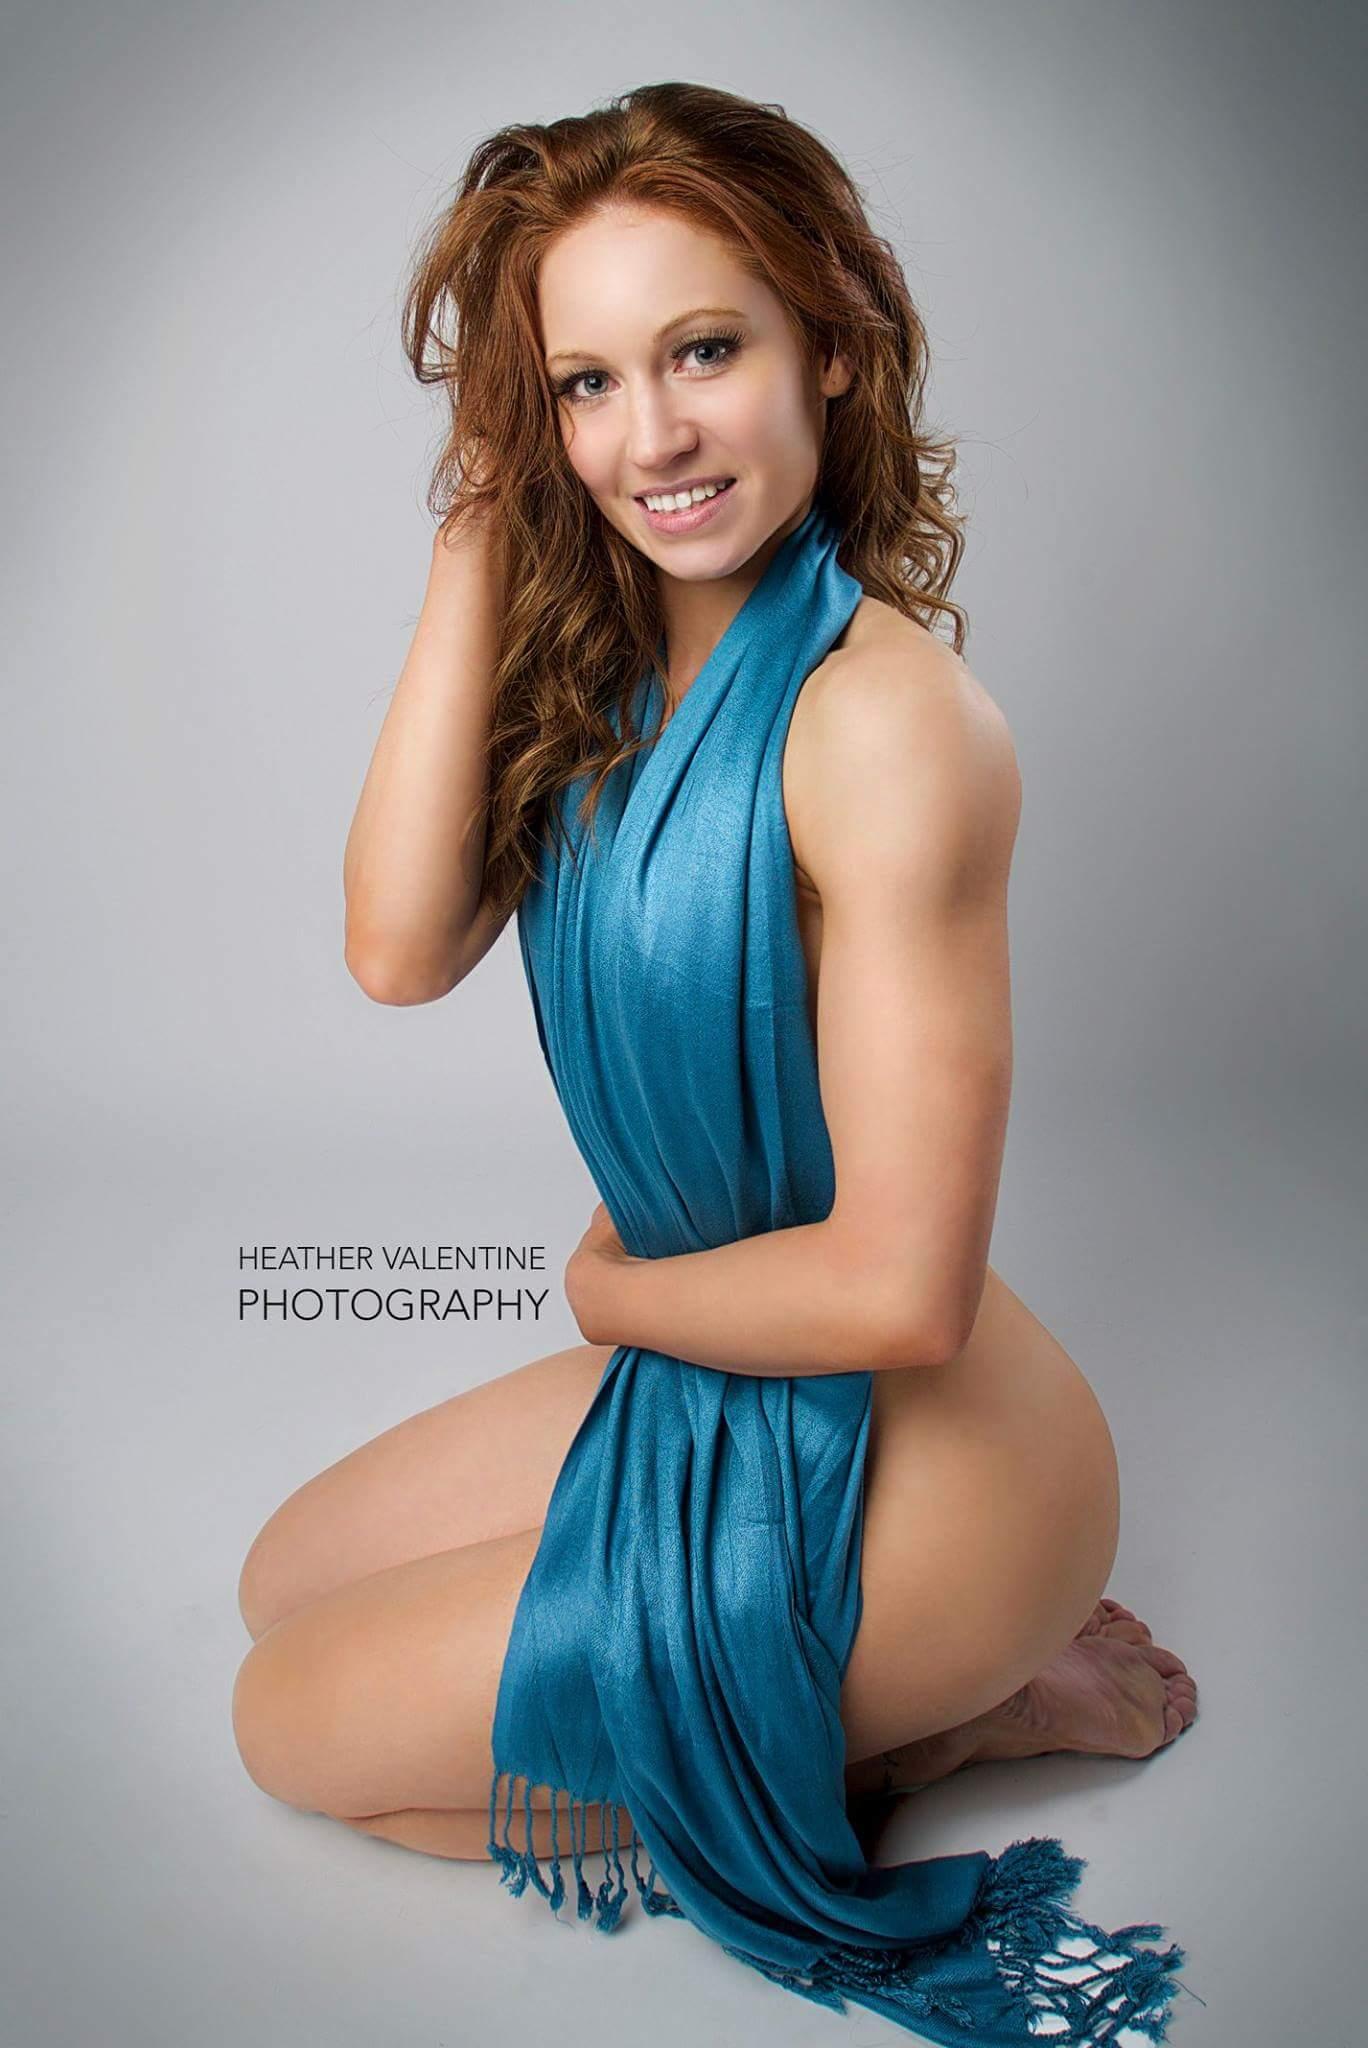 Ameture bikini modeling